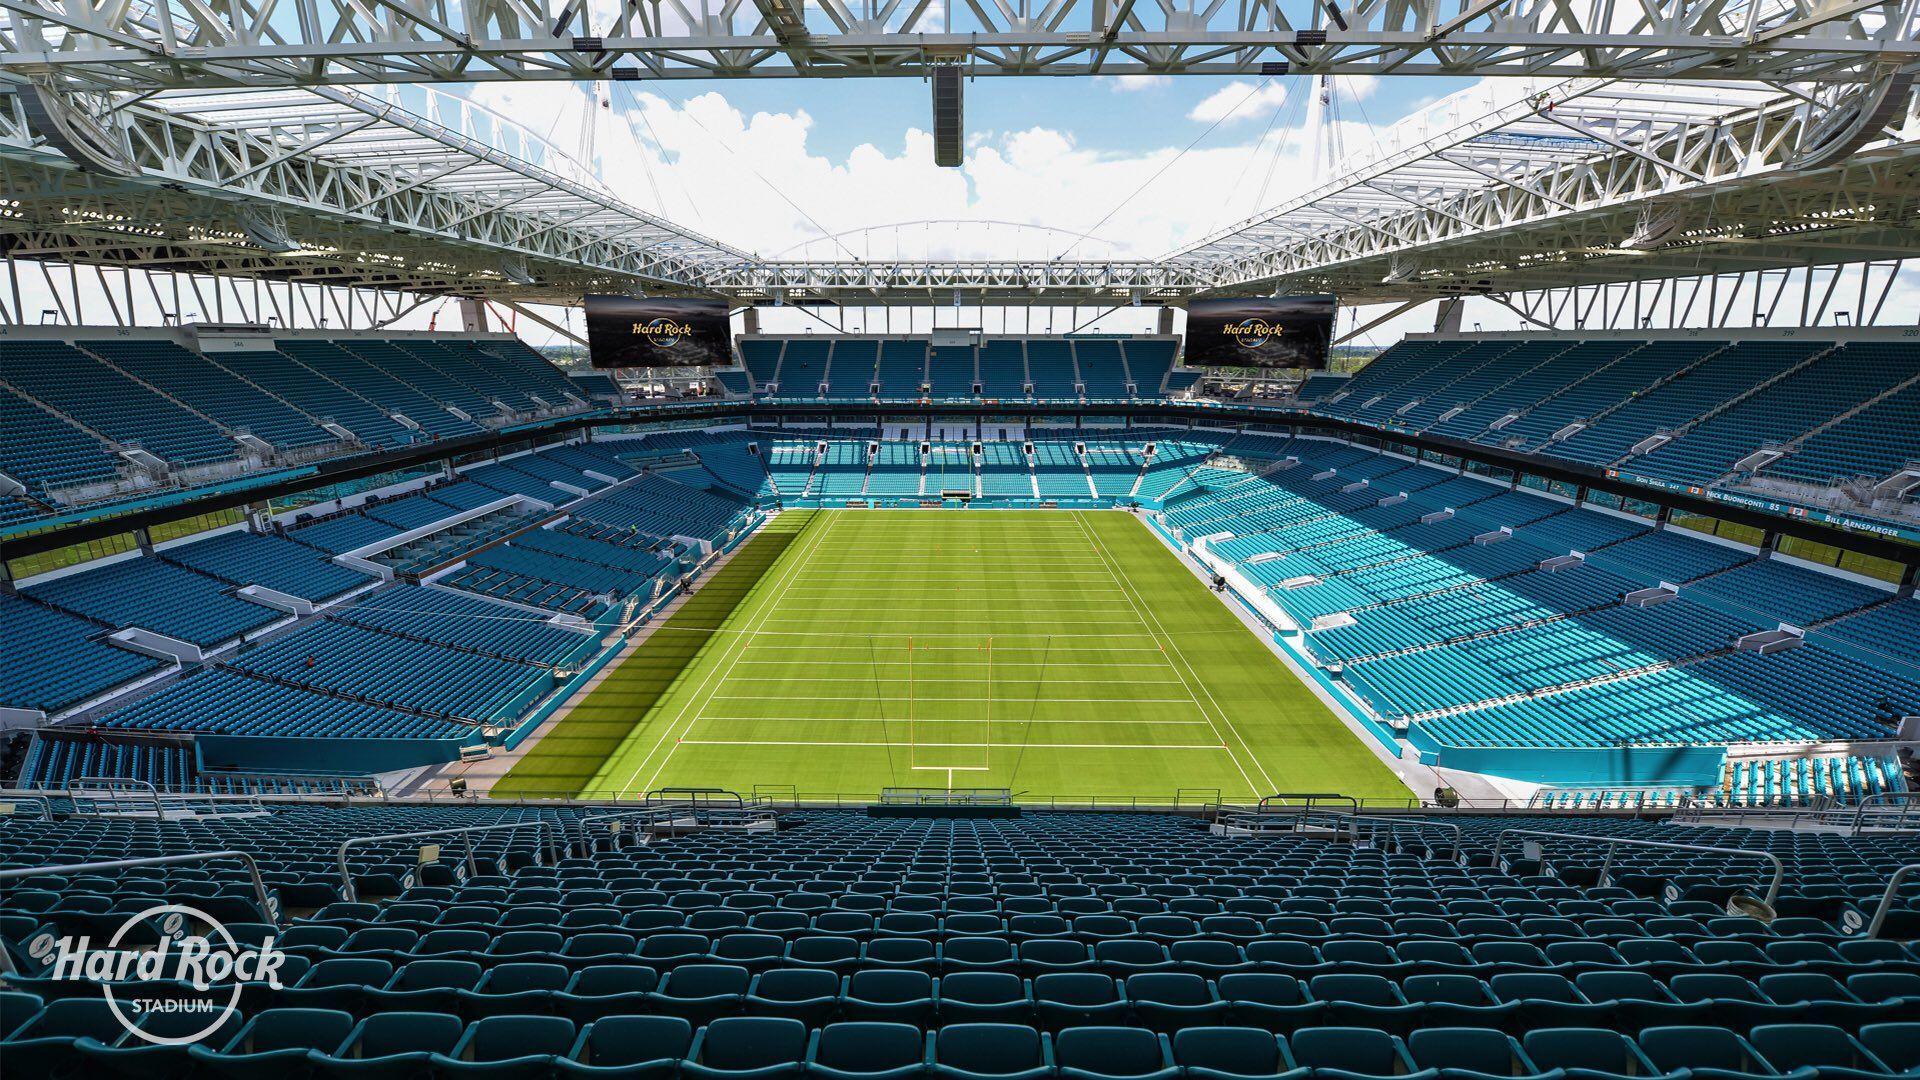 34d1013700b0728703d2fbc31c1d5113 - Hard Rock Stadium Miami Gardens Location